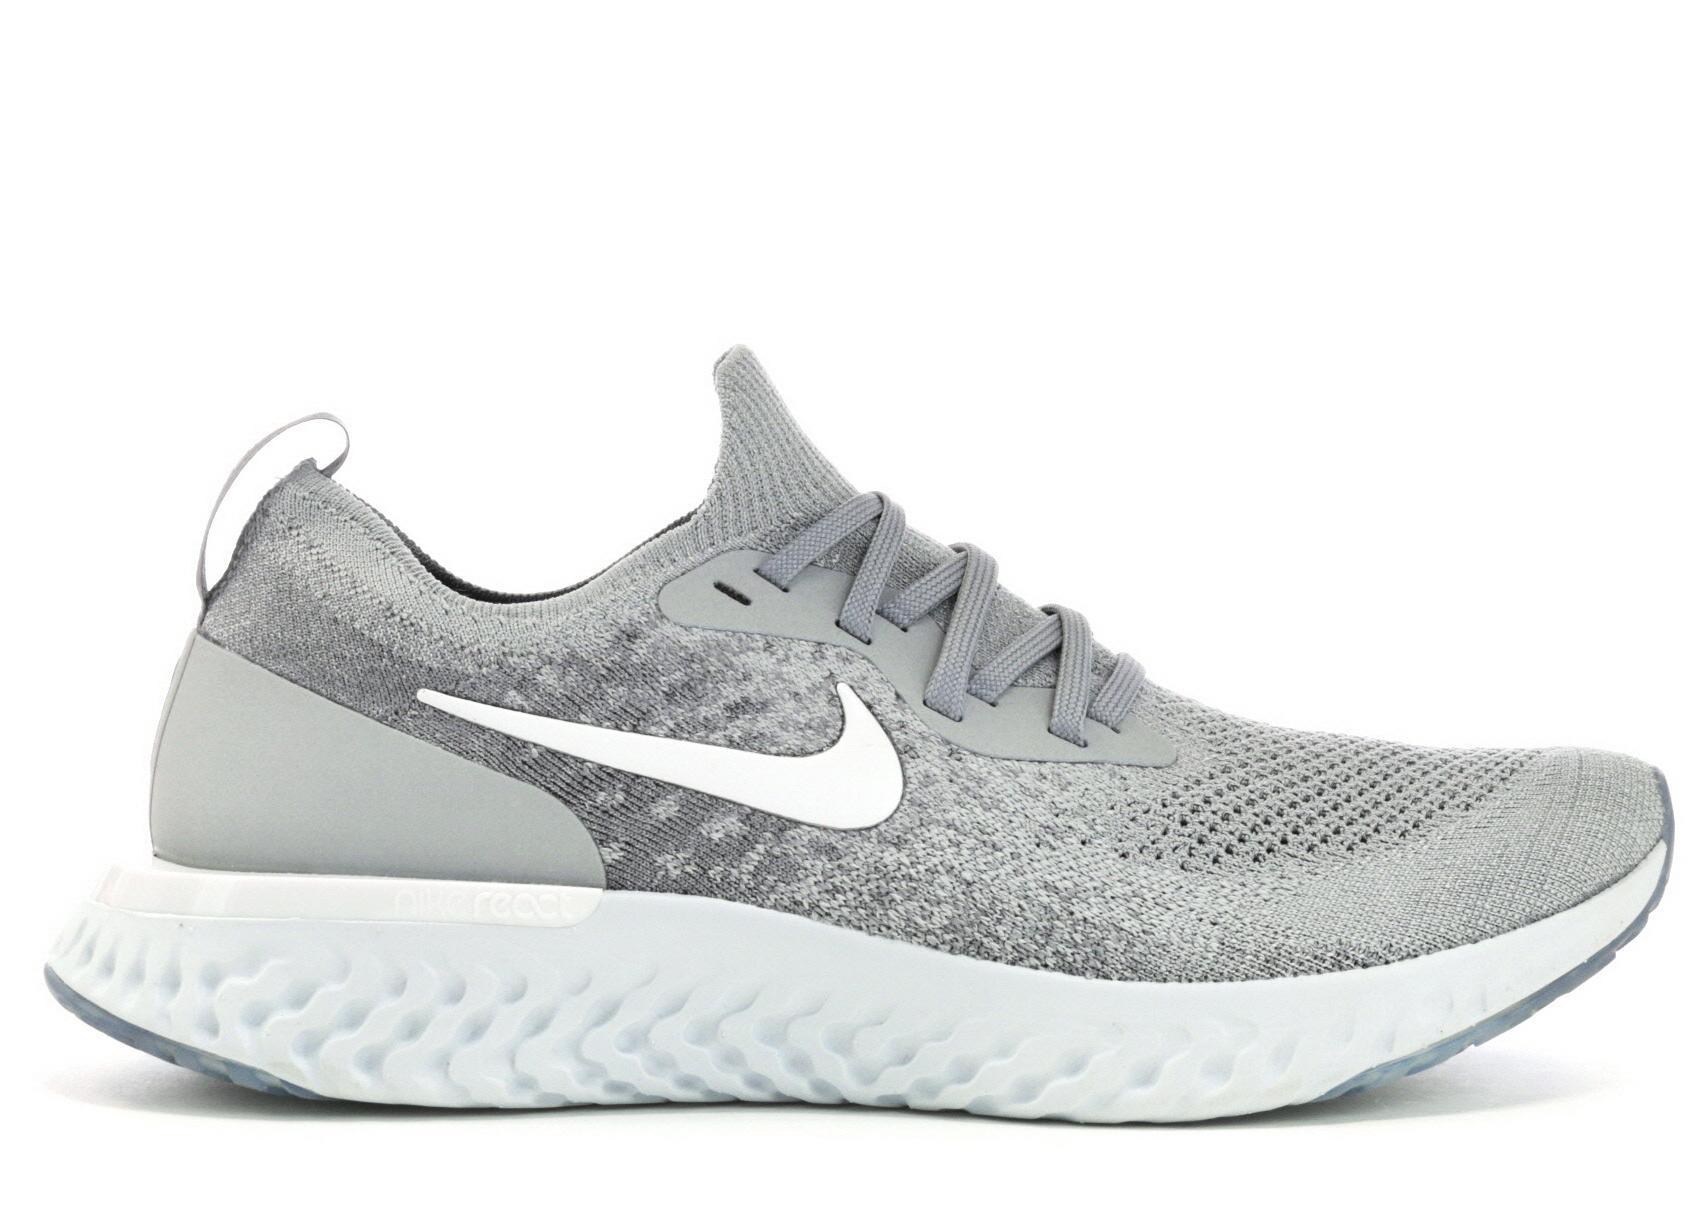 Nike Epic React Flyknit Wolf Grey in